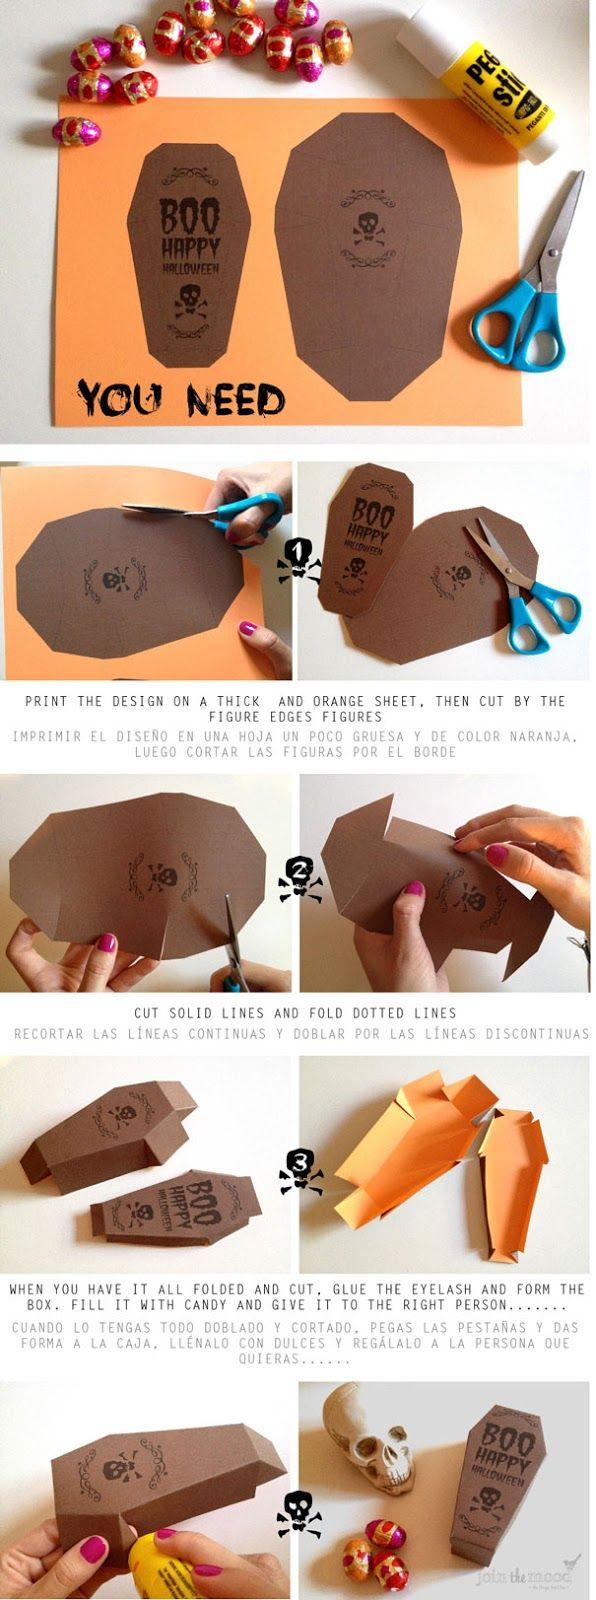 Join the Mood: DIY A HALLOWEEN BOX GIFT